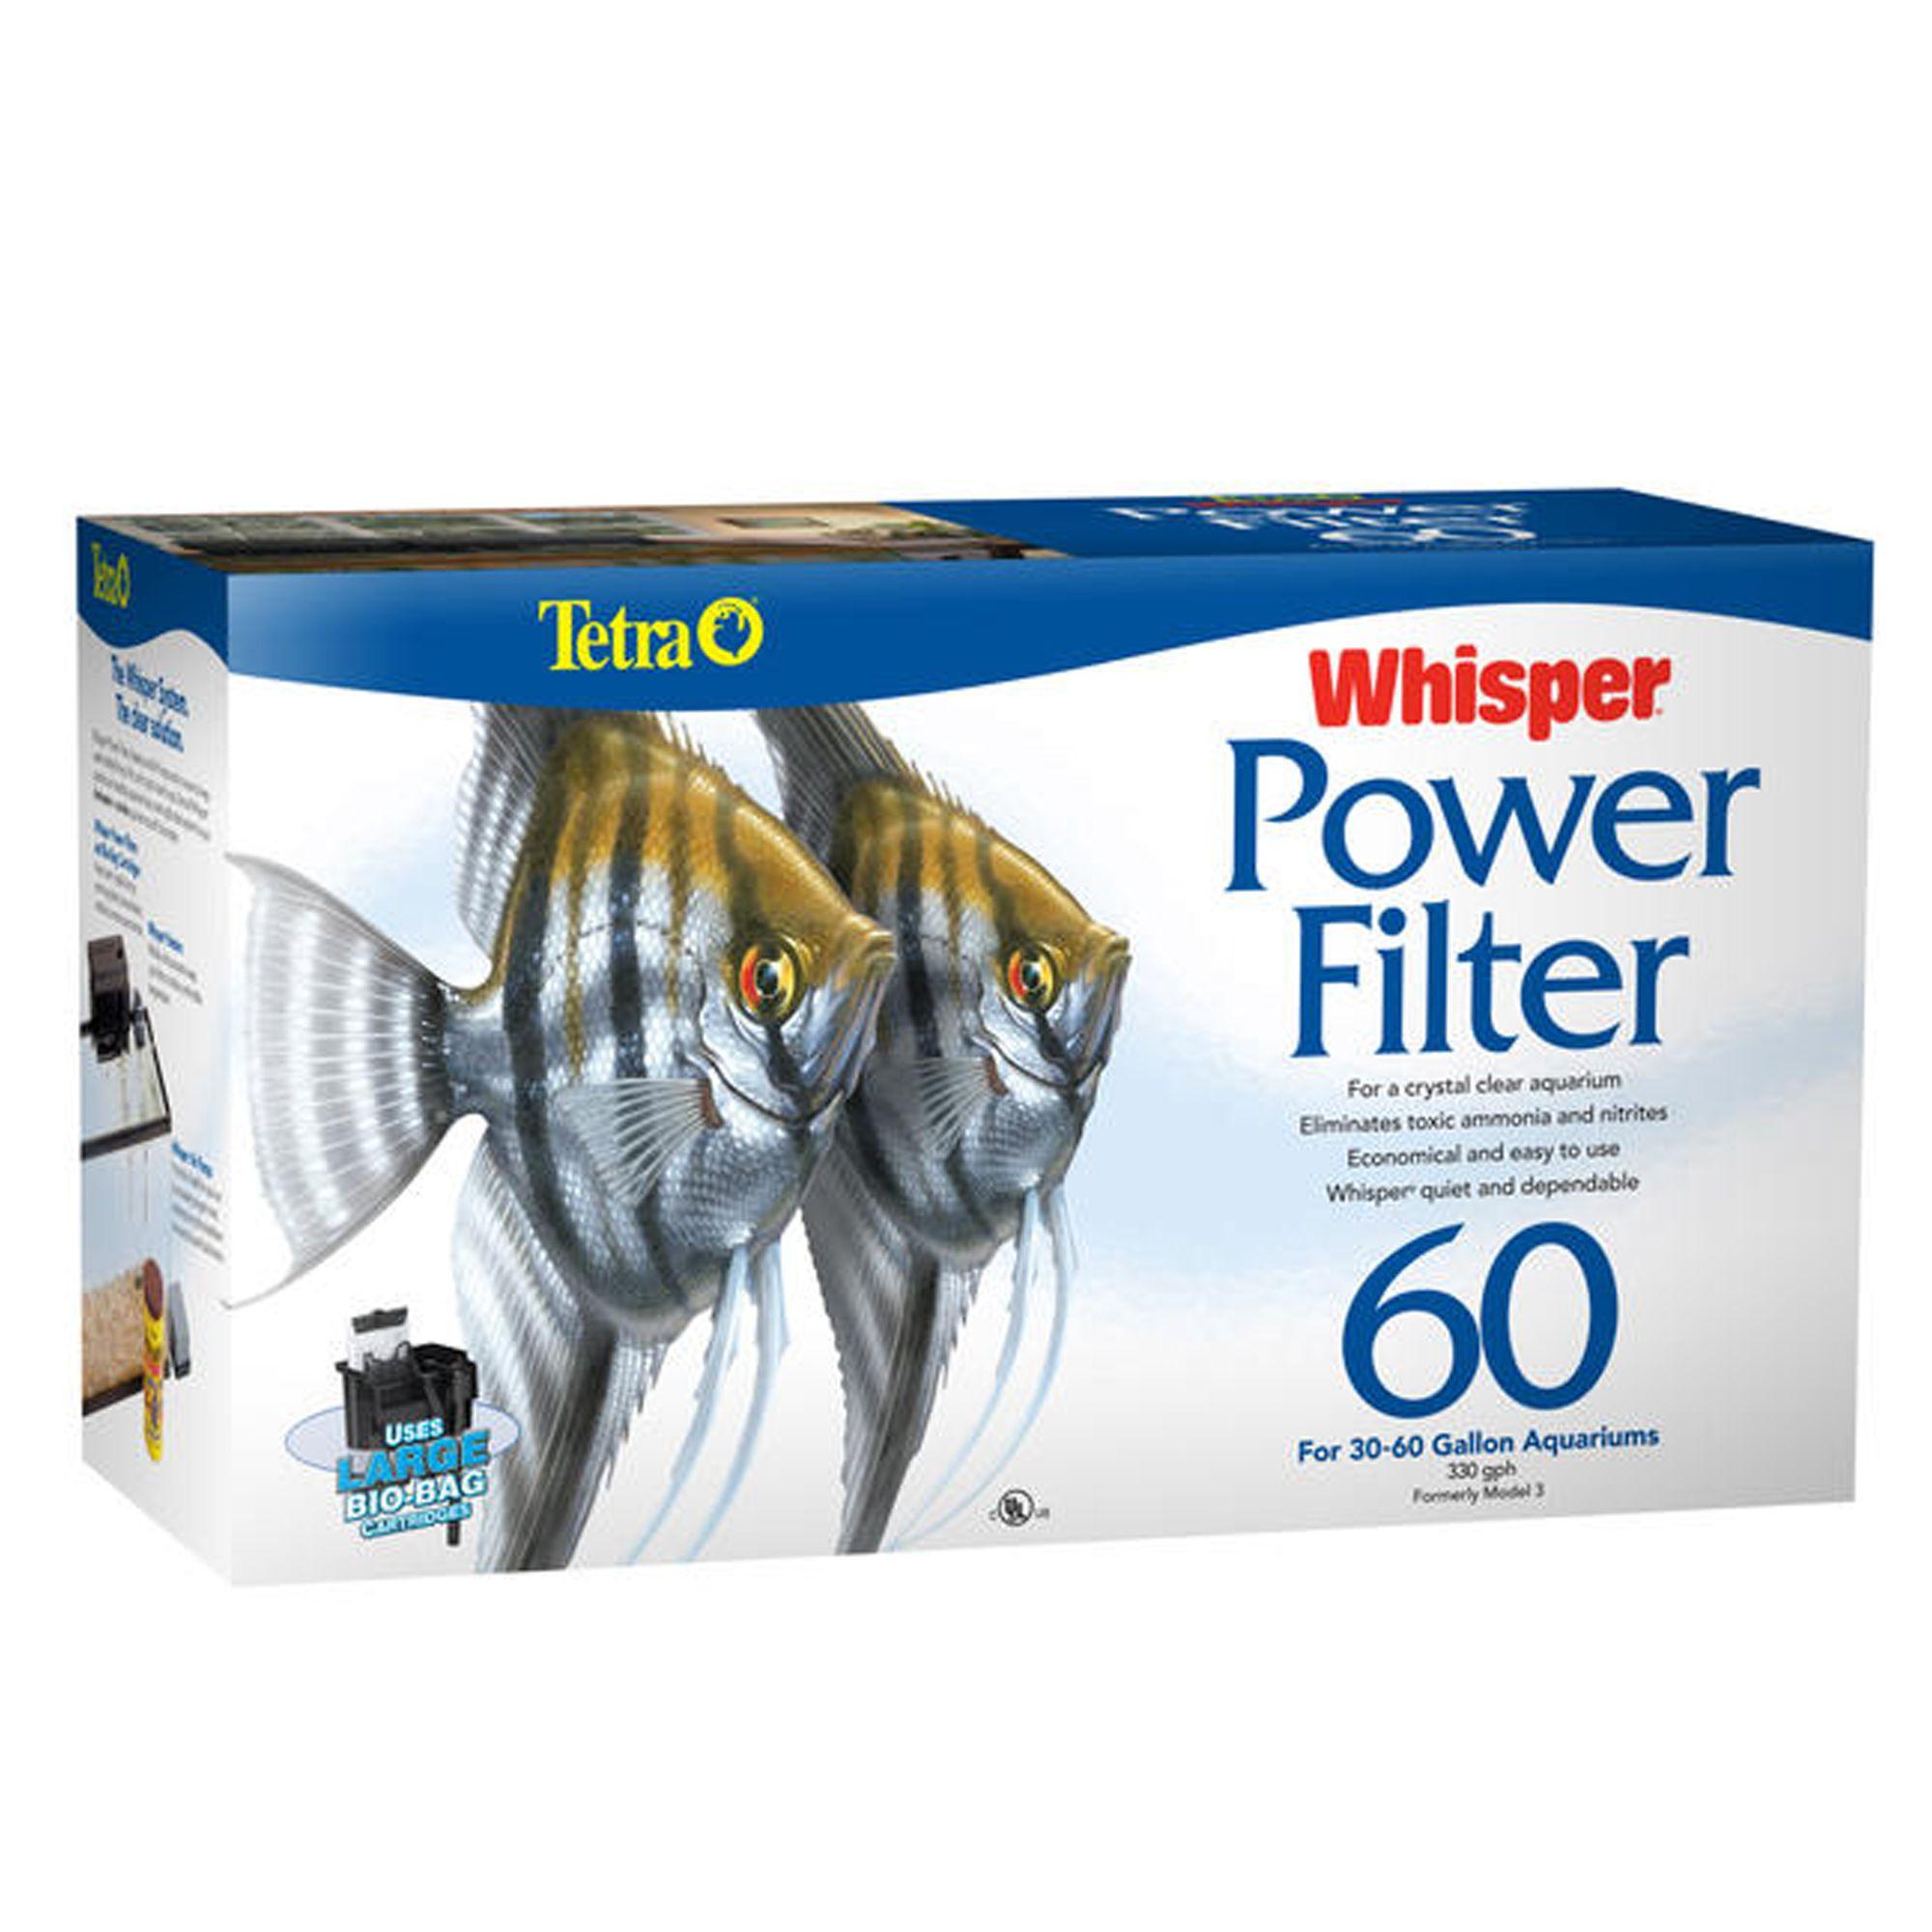 Tetra® Whisper Power Filter size: 60 Gal 1833536